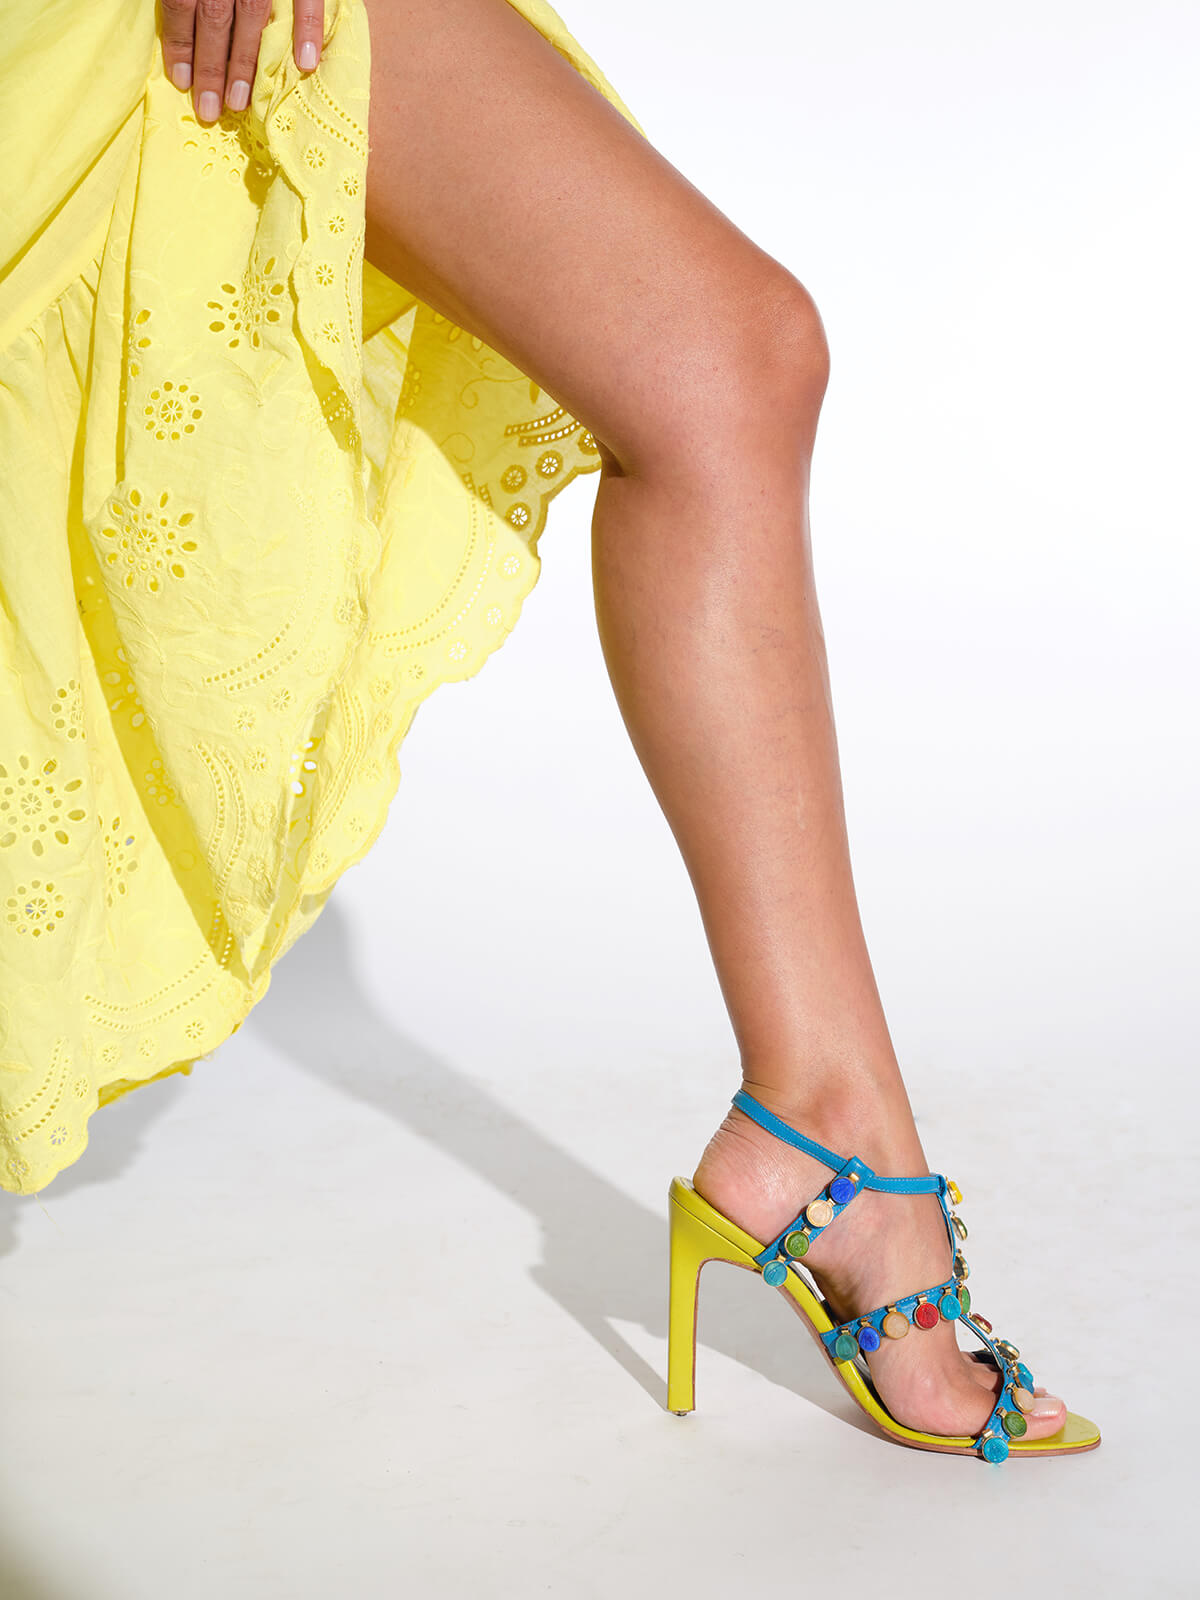 İspanyol marka vintage ayakkabı